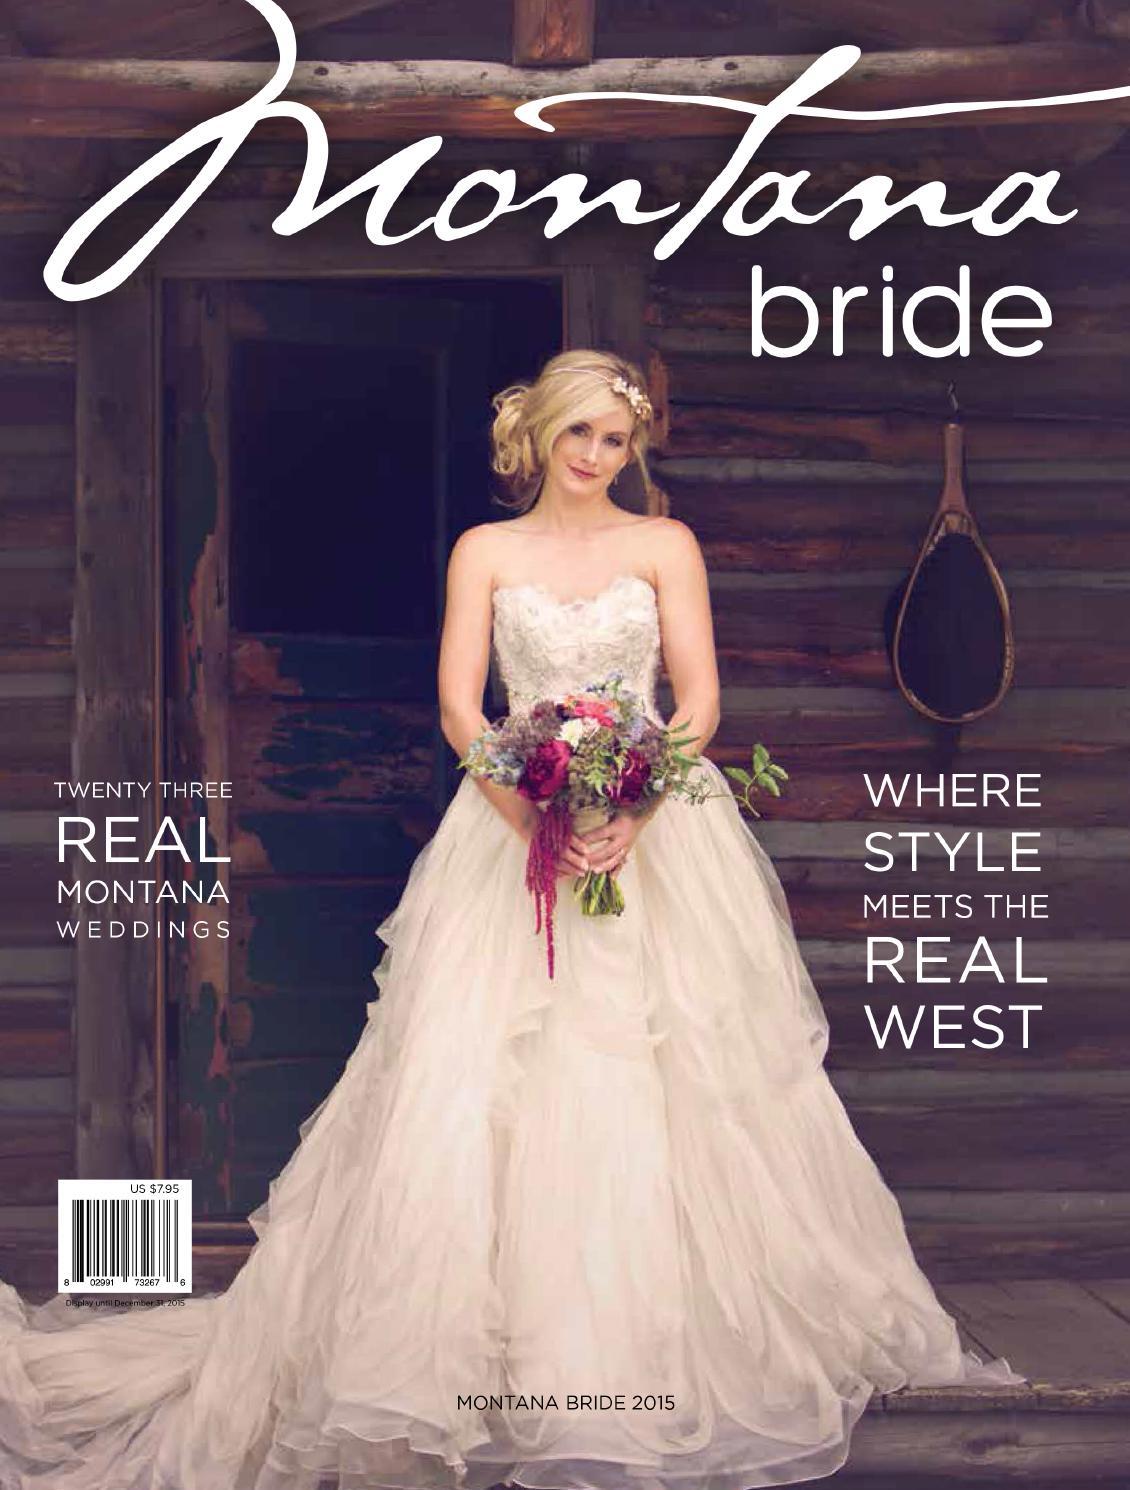 Montana Bride 2015 issue by Montana Bride - issuu